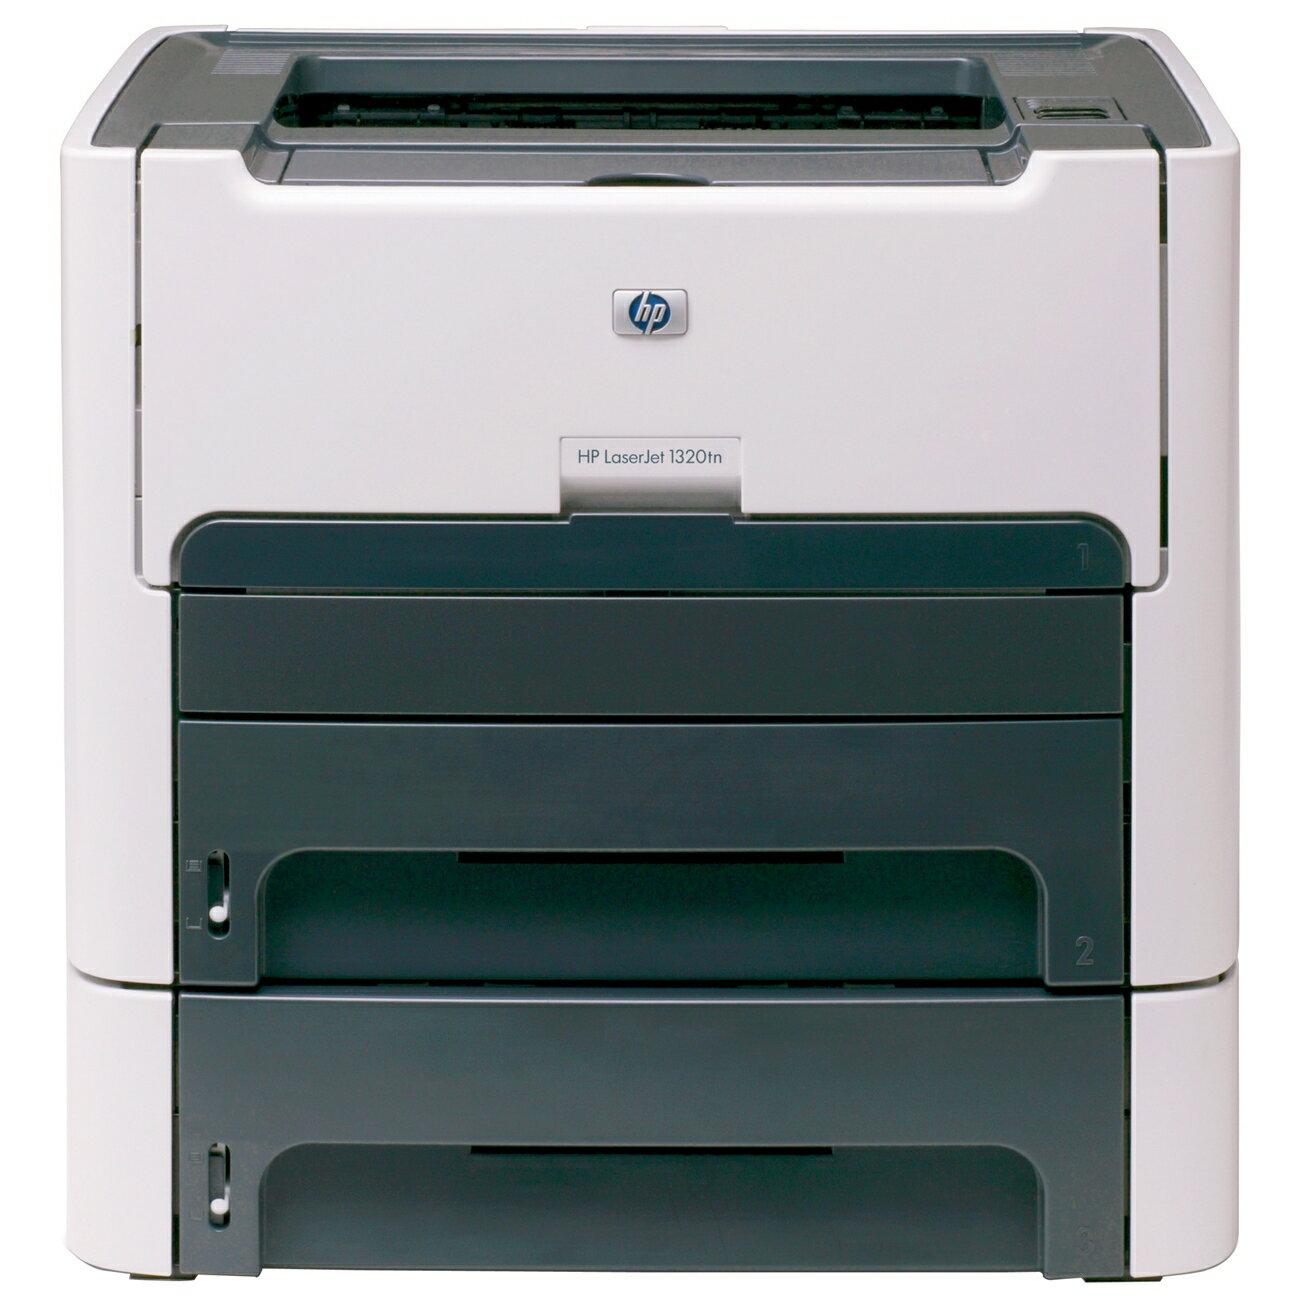 HP LaserJet 1320tn Printer 0